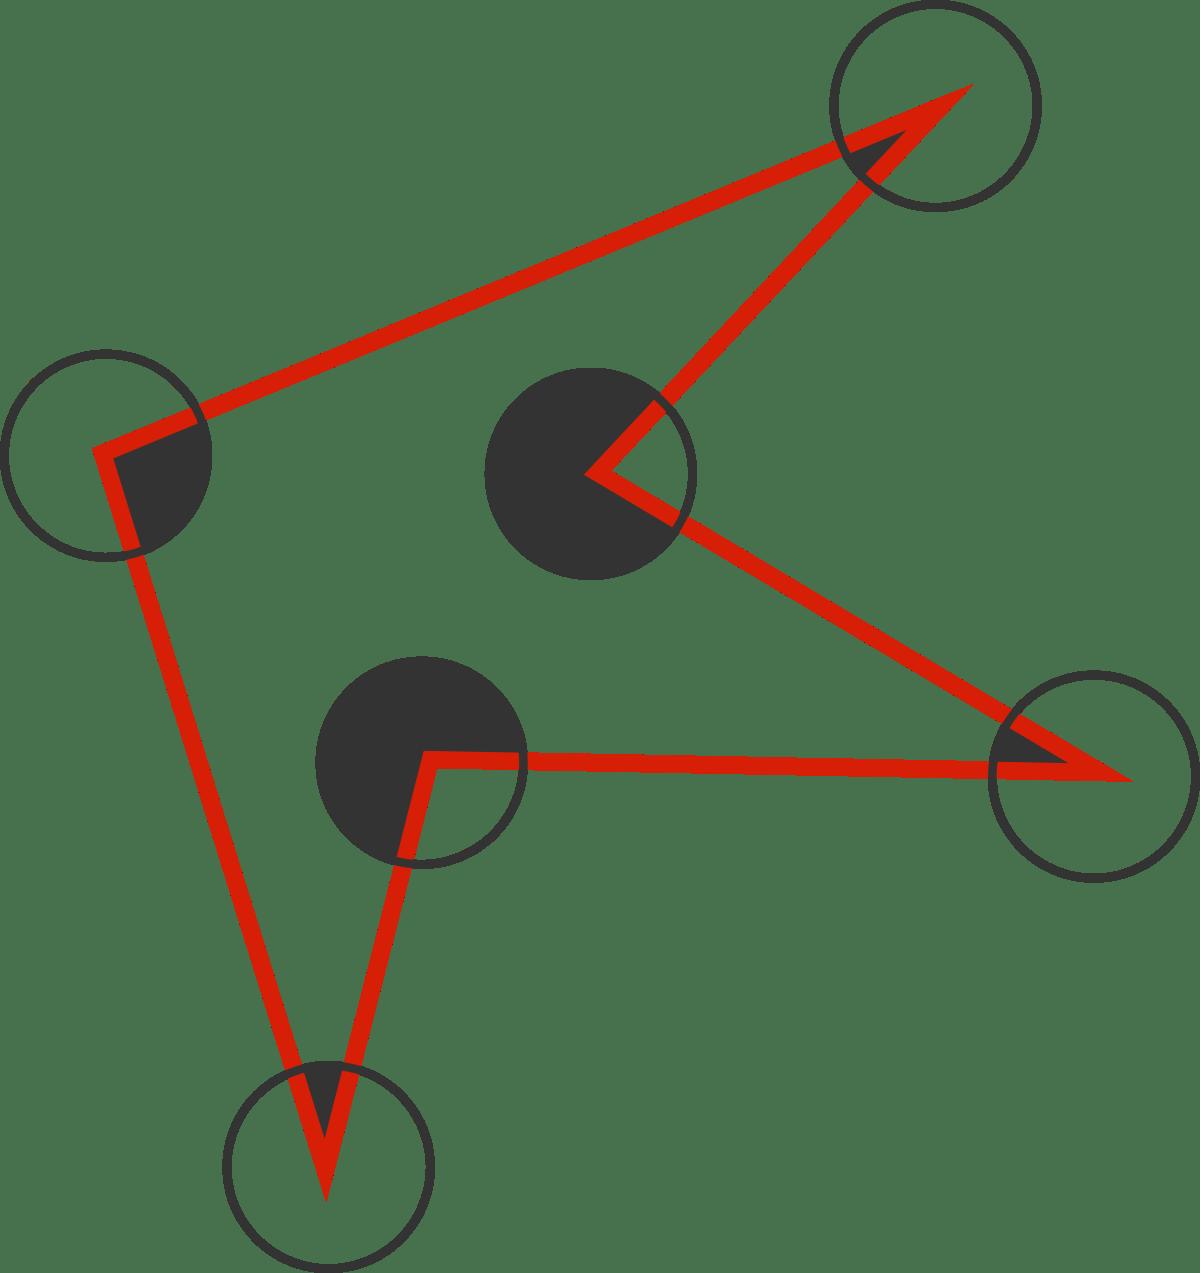 Hexagon Clipart Irregular Hexagon Irregular Transparent